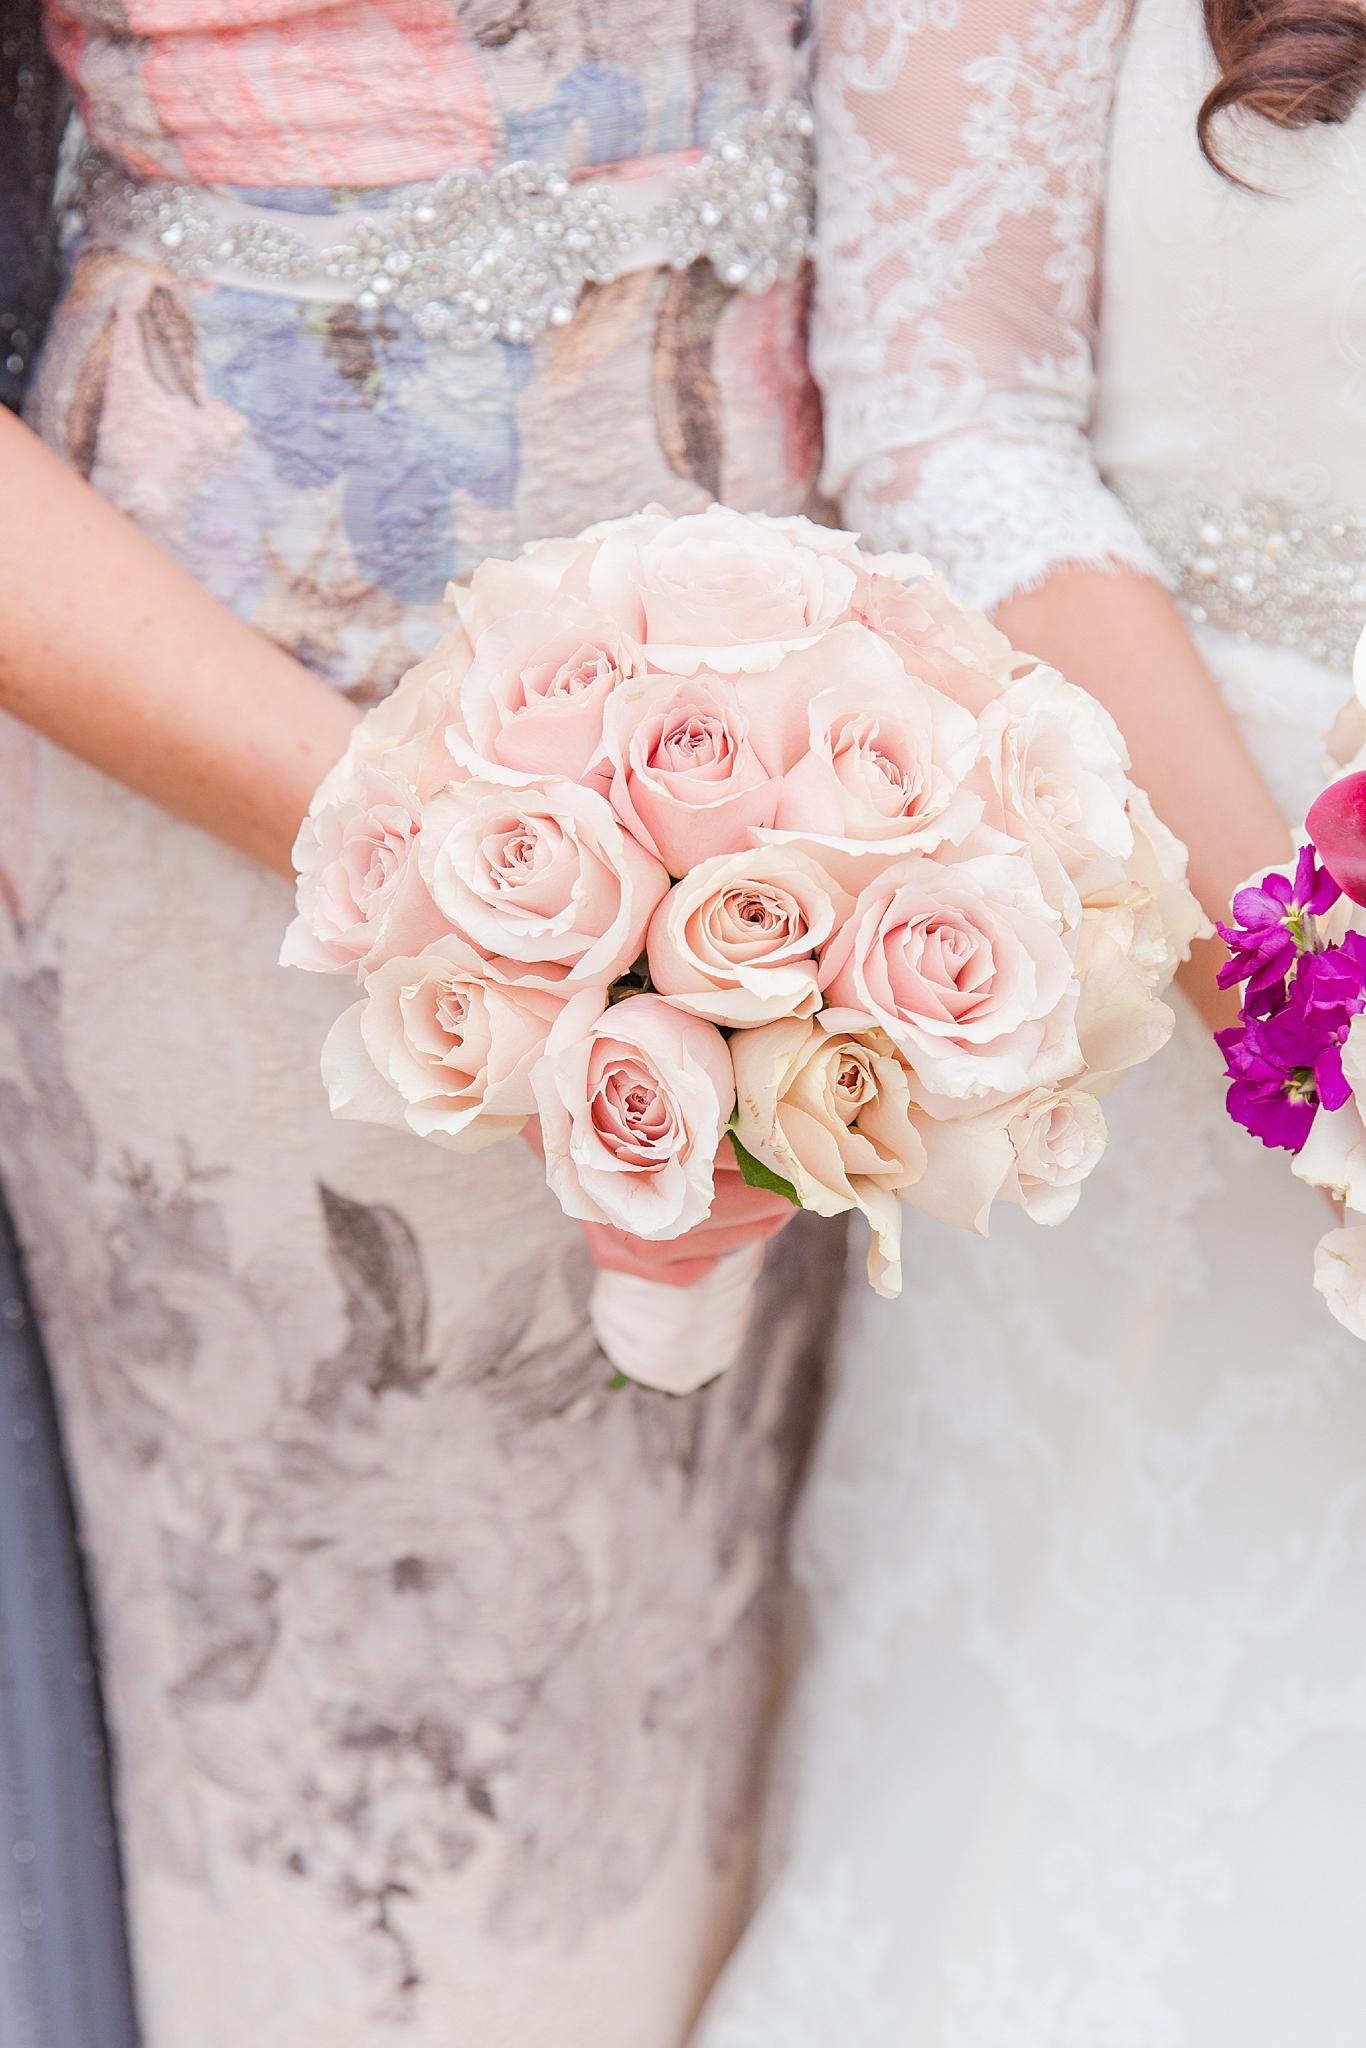 detroit-colony-club-wedding-regal-romantic-photography-in-detroit-mi-by-courtney-carolyn-photography_0008.jpg